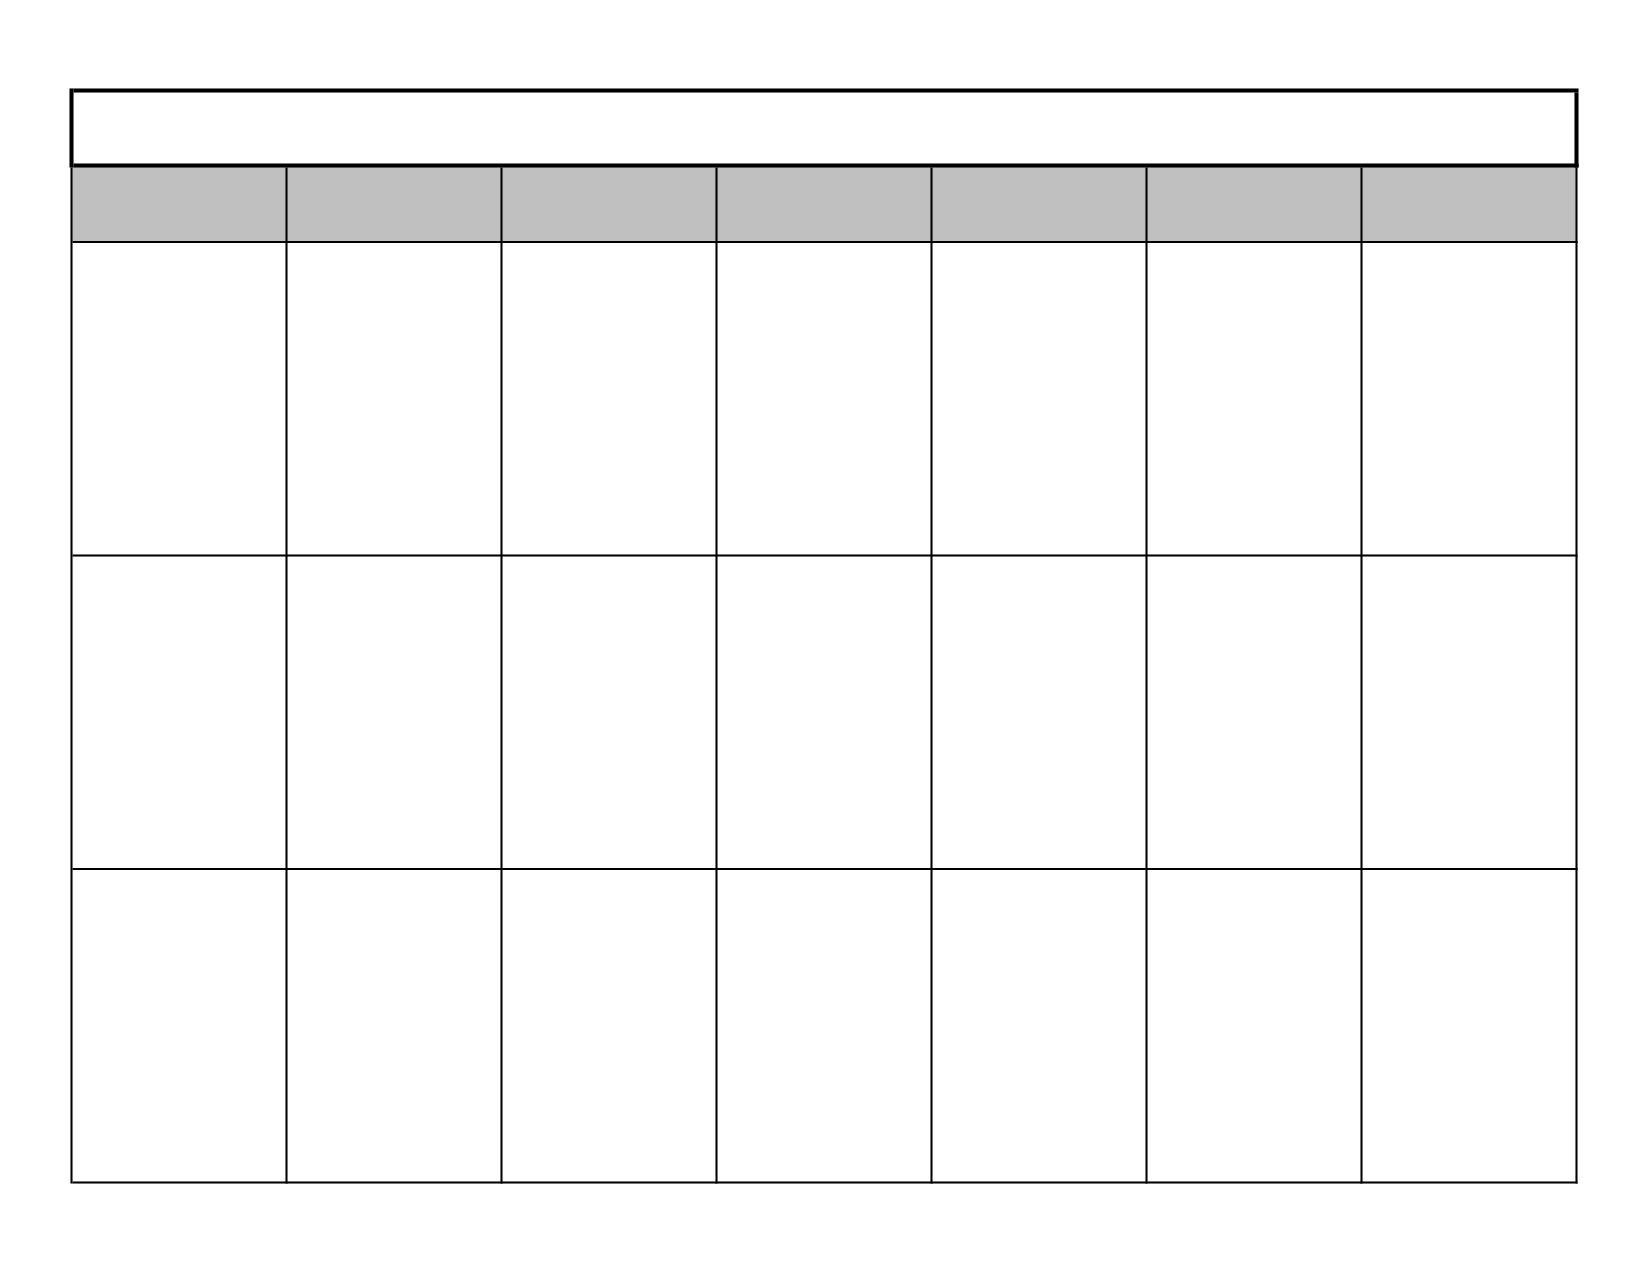 Blank Calendar Template Aplg Planetariums Org Ripping 2 Week-Printable 2 Week Blank Calendar Template